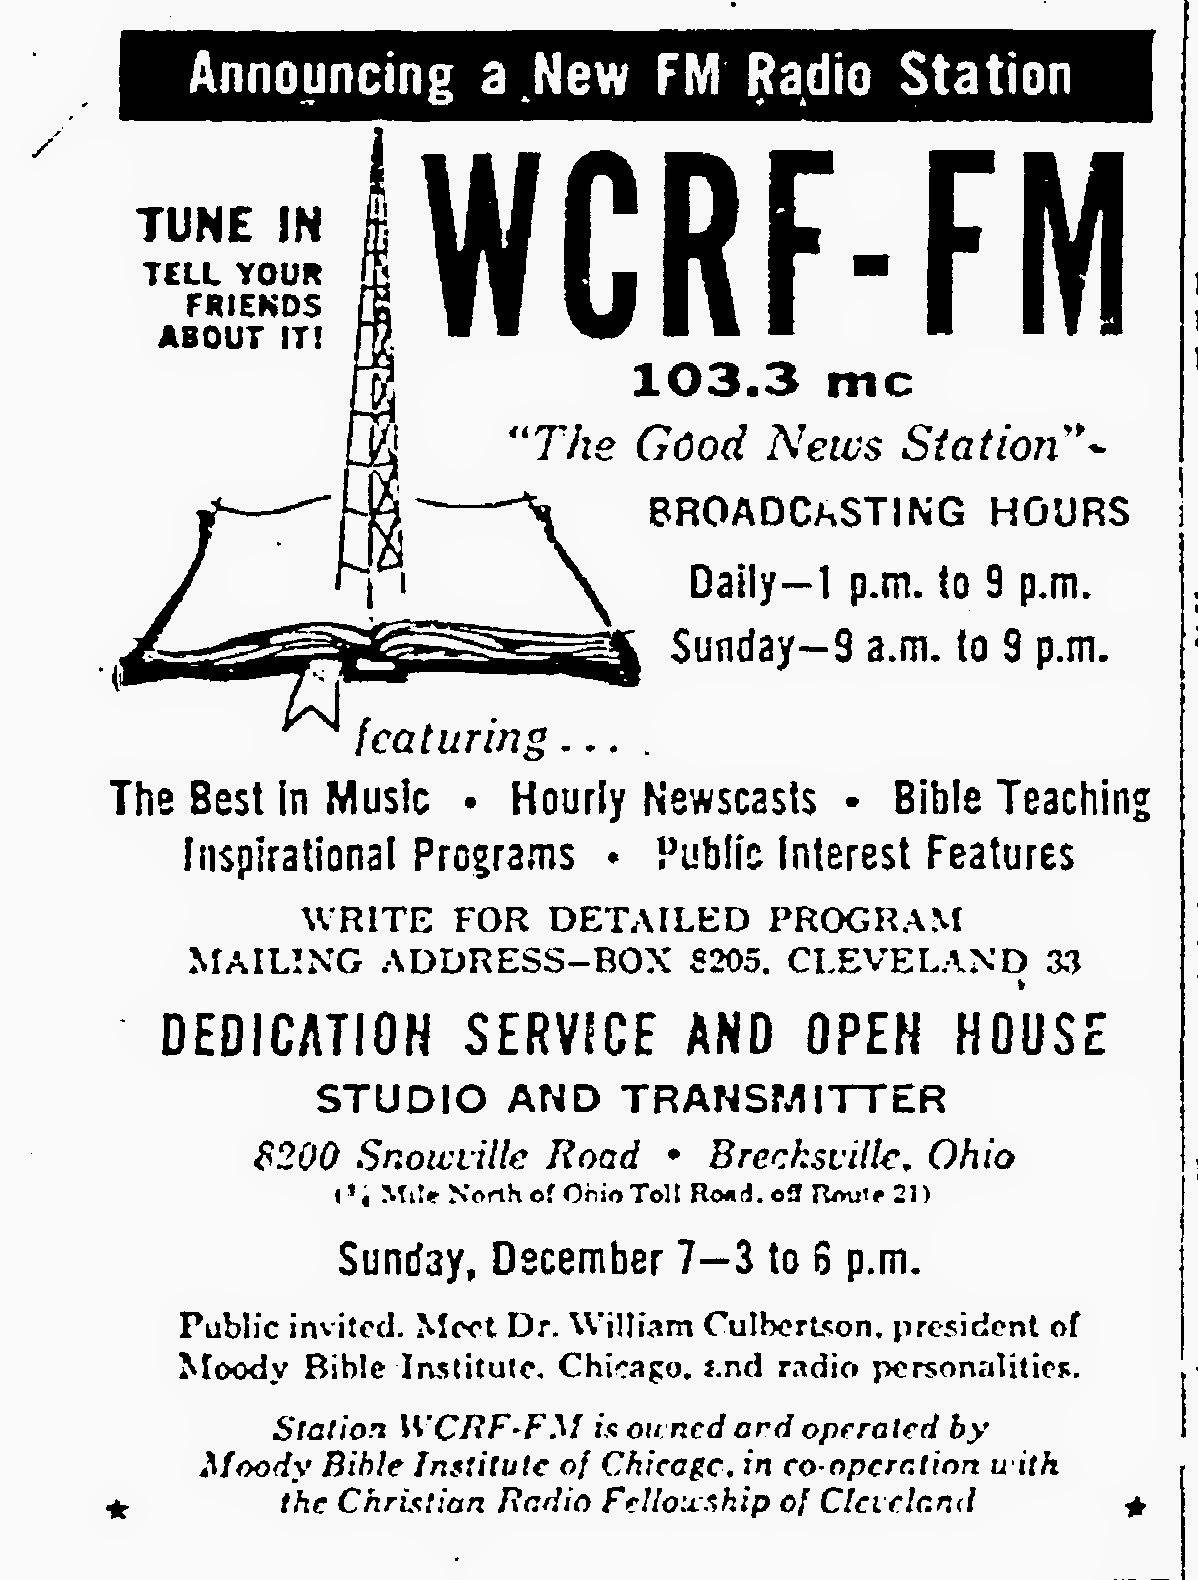 Cleveland Classic Media